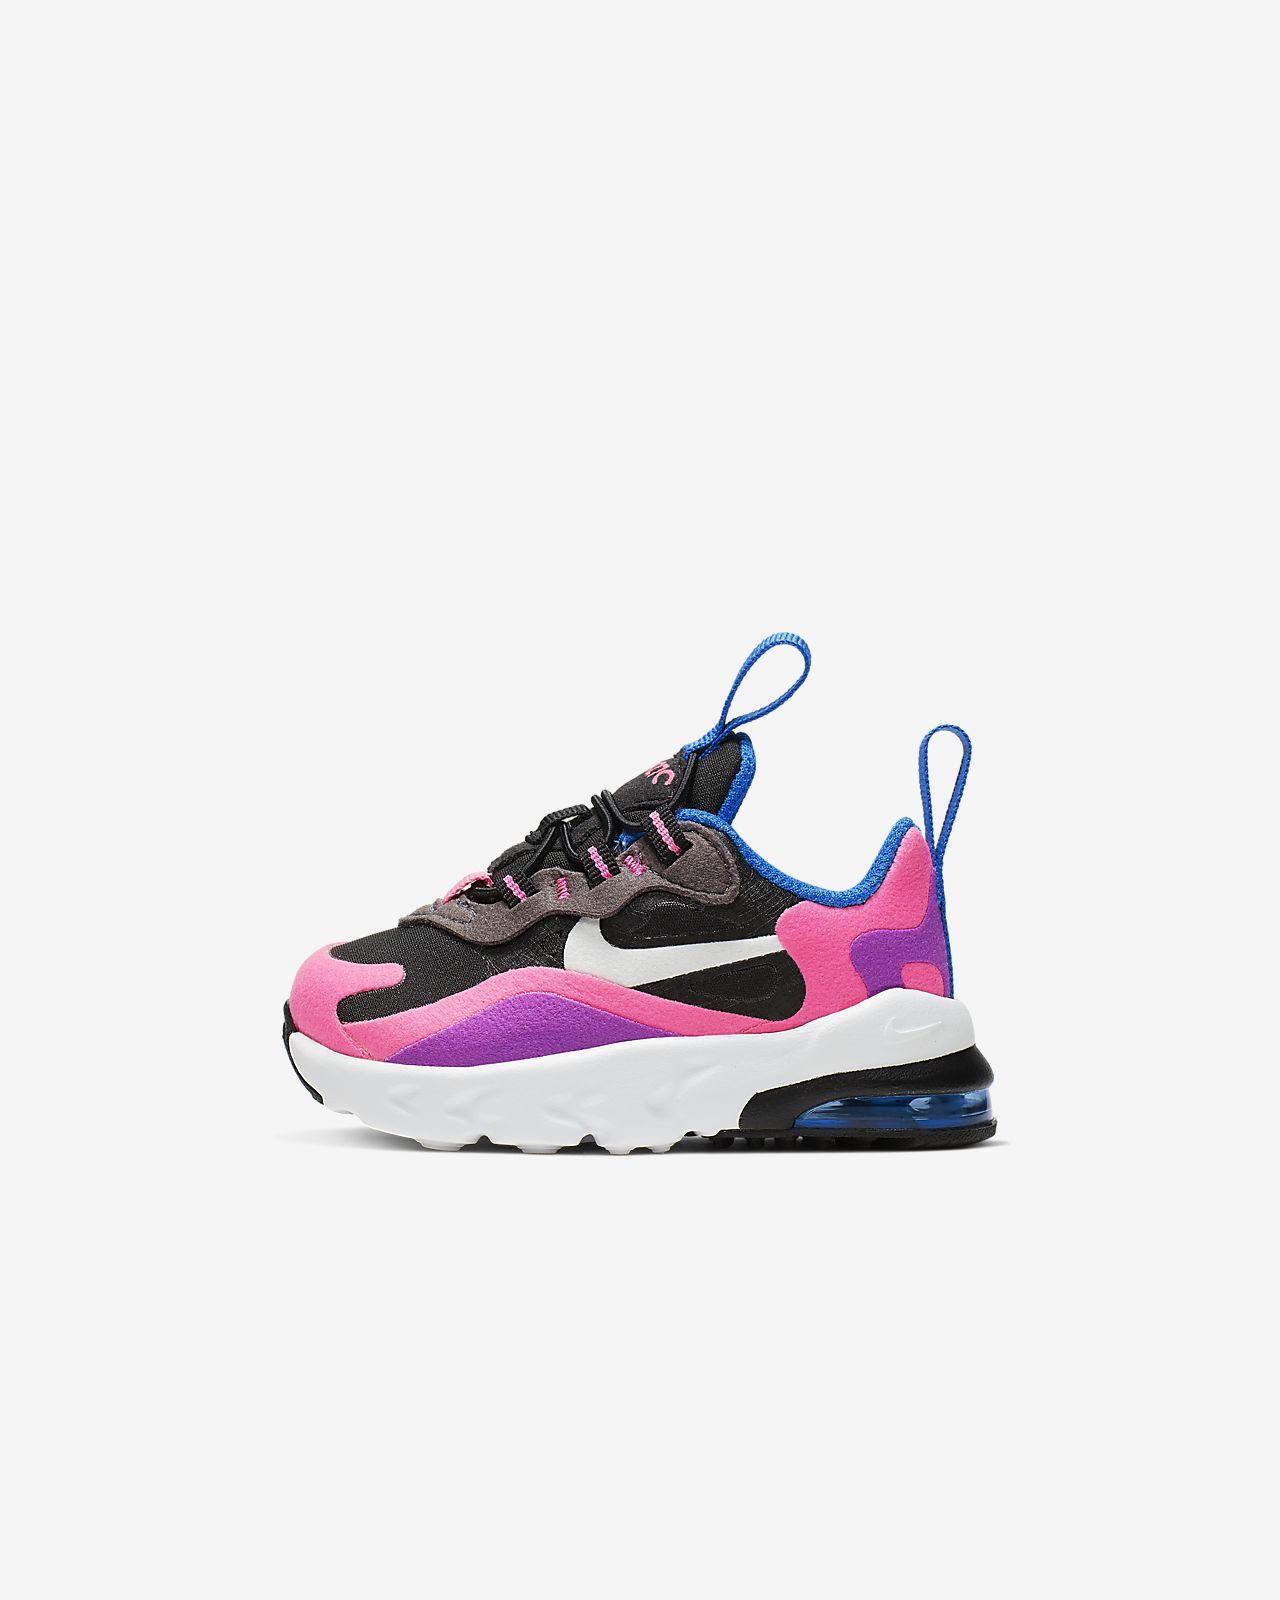 Buty dla niemowląt/maluchów Nike Air Max 270 RT